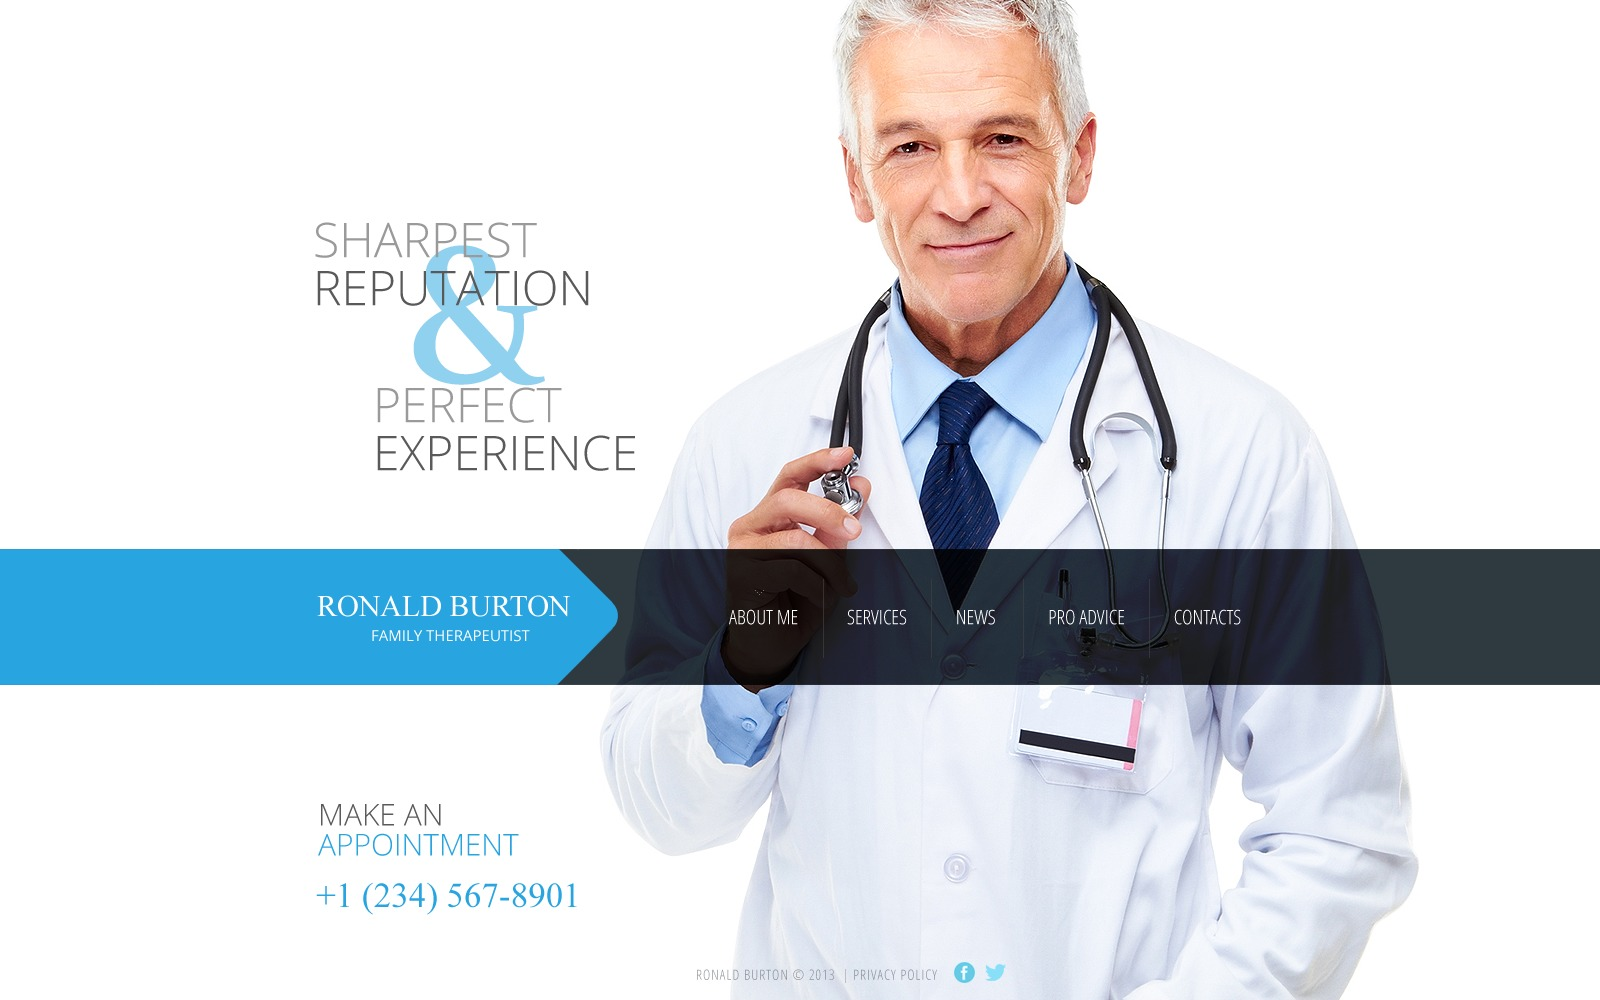 Medical Website Template - Medical website templates